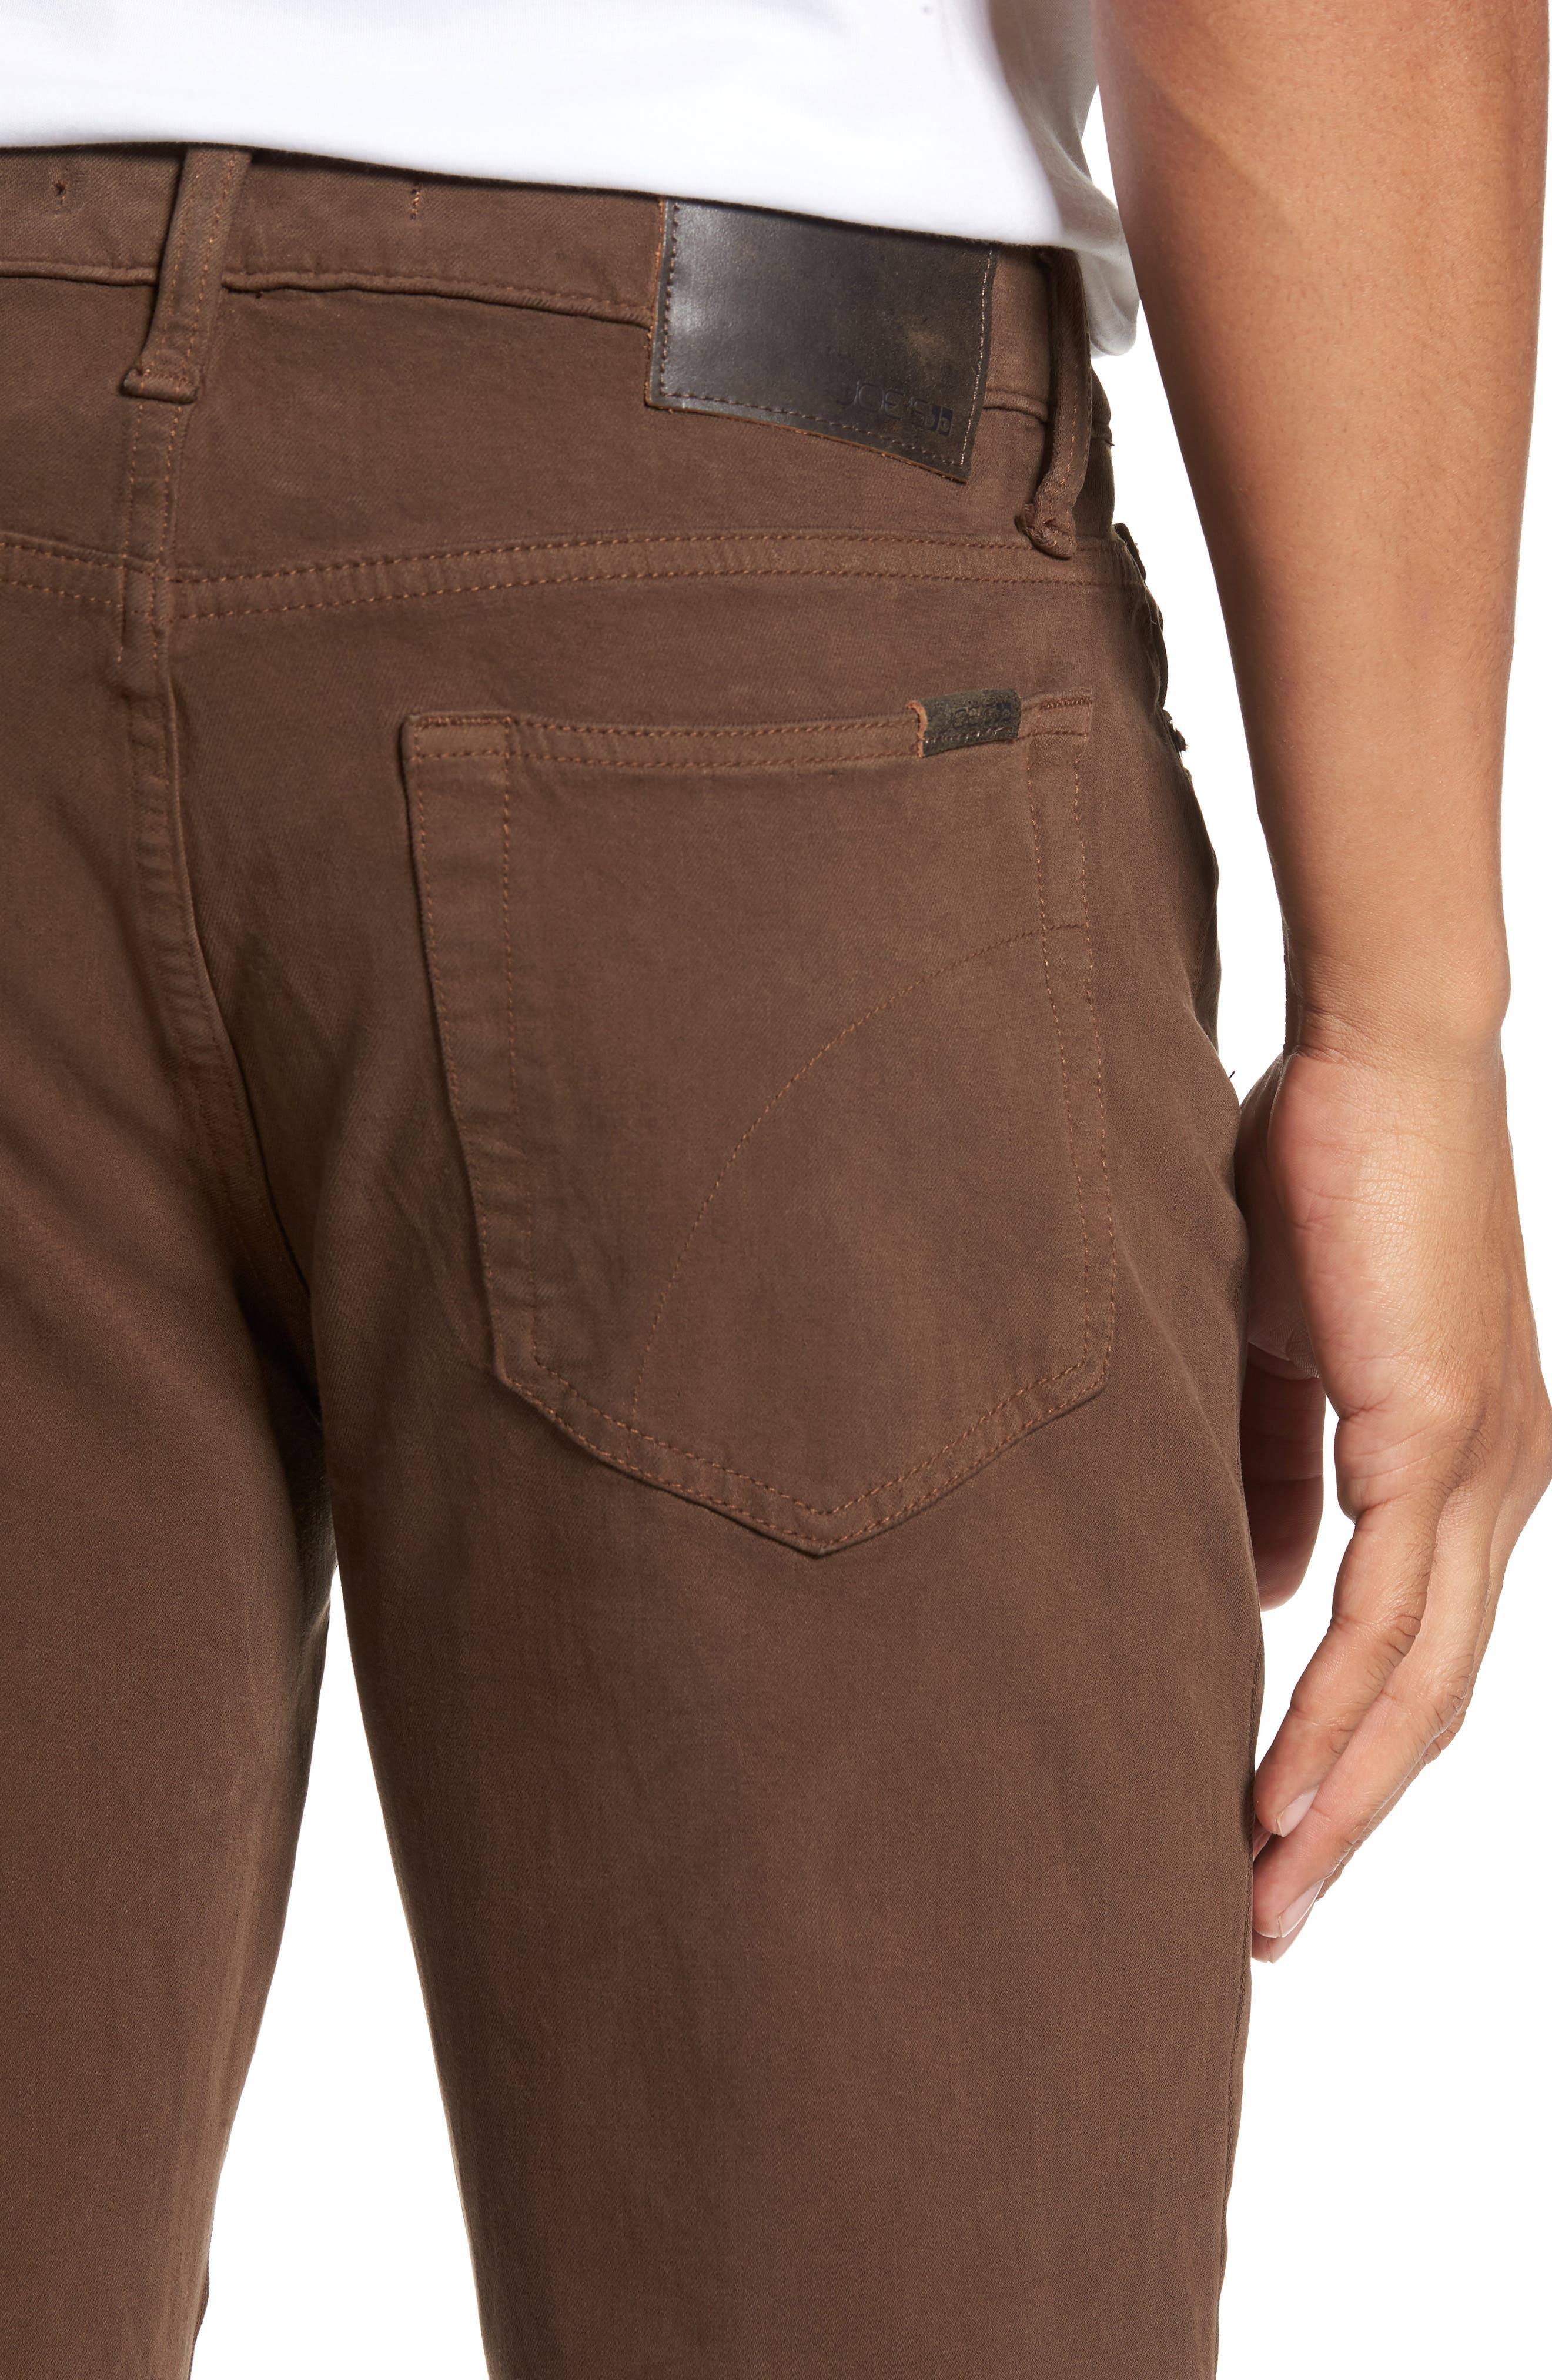 Brixton Slim Straight Fit Jeans,                             Alternate thumbnail 4, color,                             202